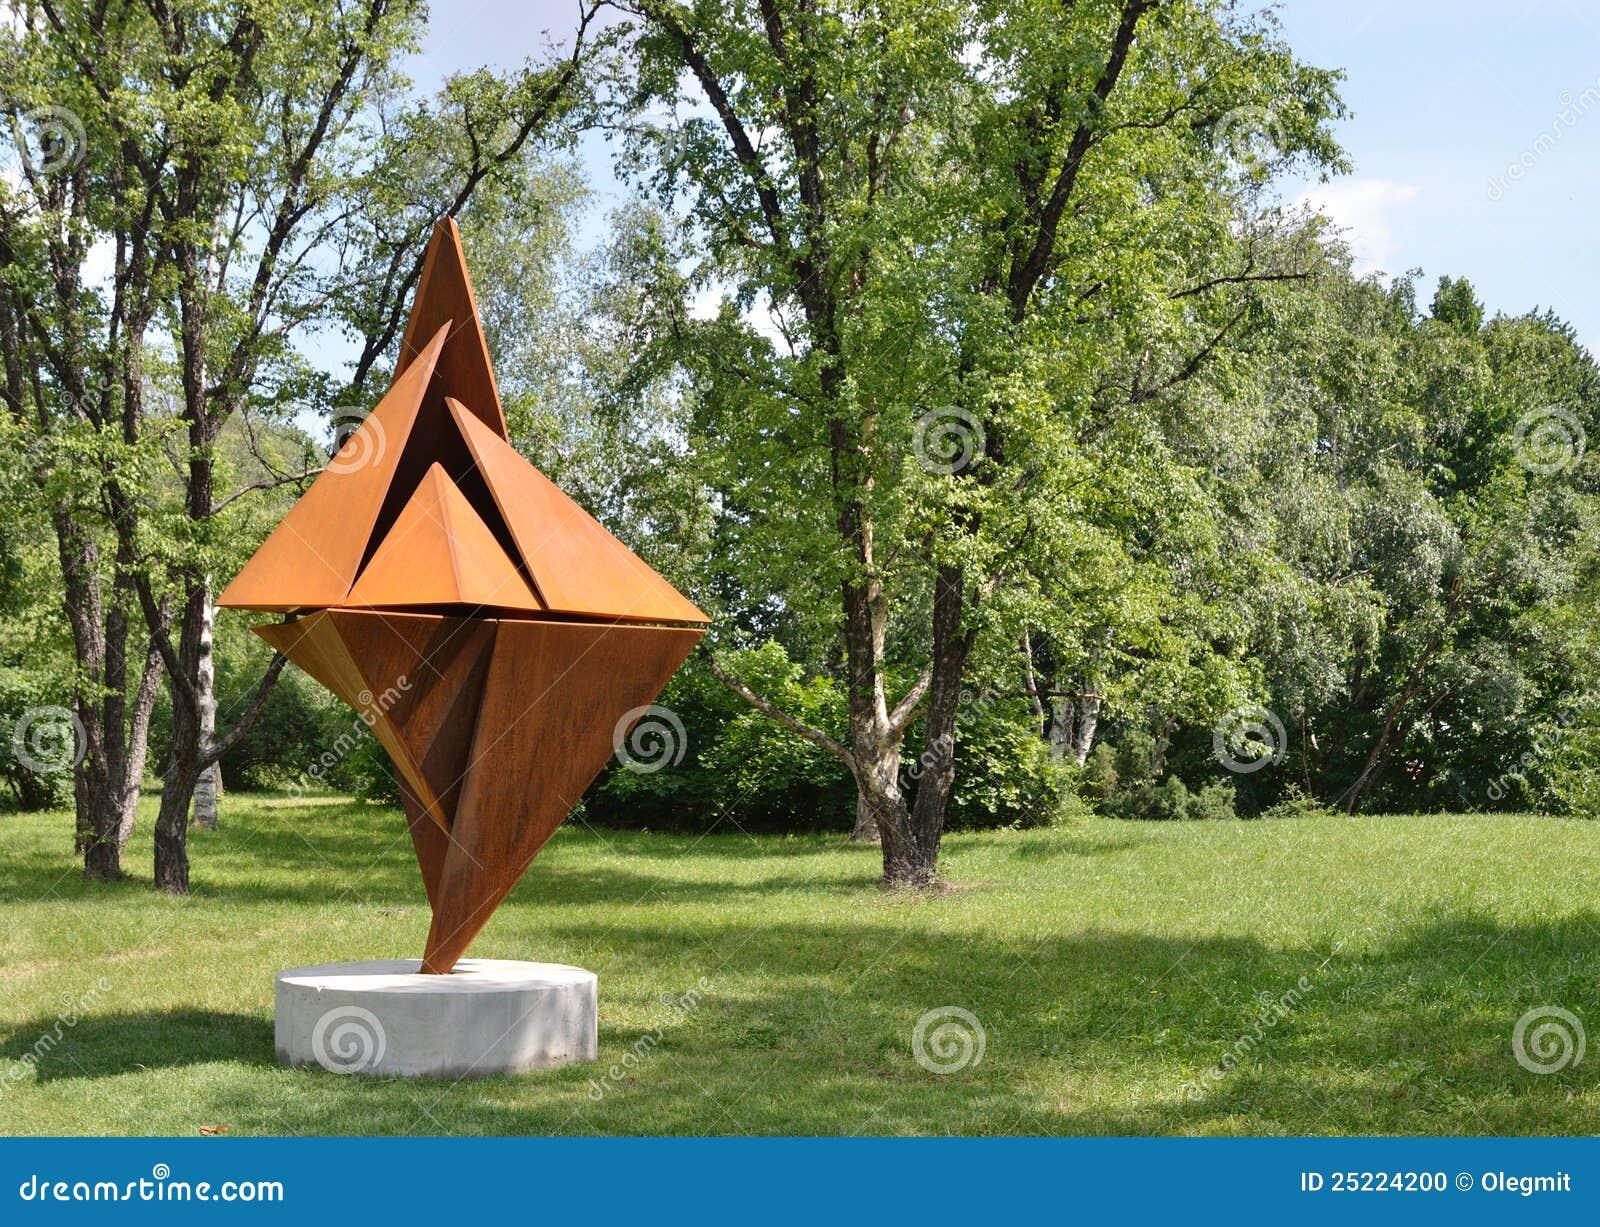 Escultura Moderna En El Jardin Botanico Imagen Editorial Imagen De - Escultura-jardin